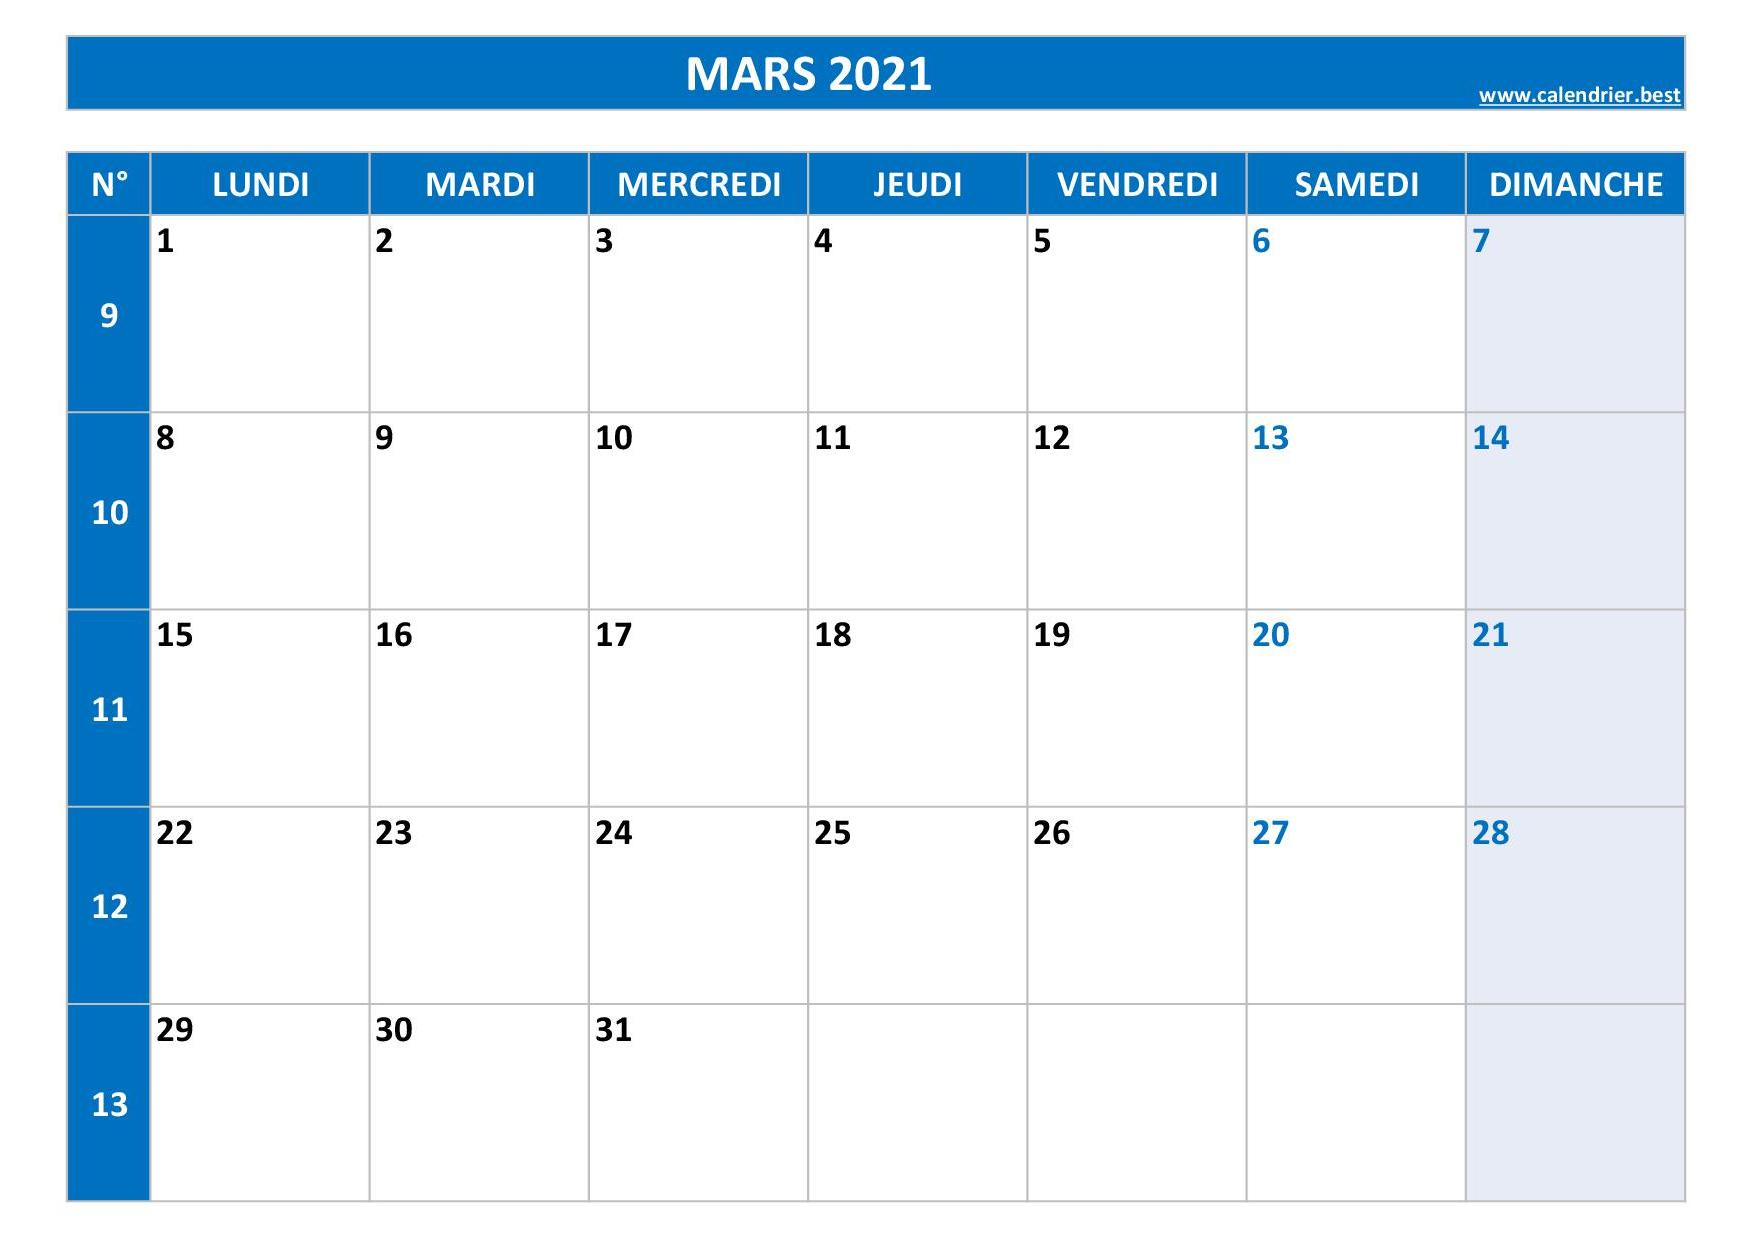 Calendrier Mars 2021 à consulter ou imprimer  Calendrier.best